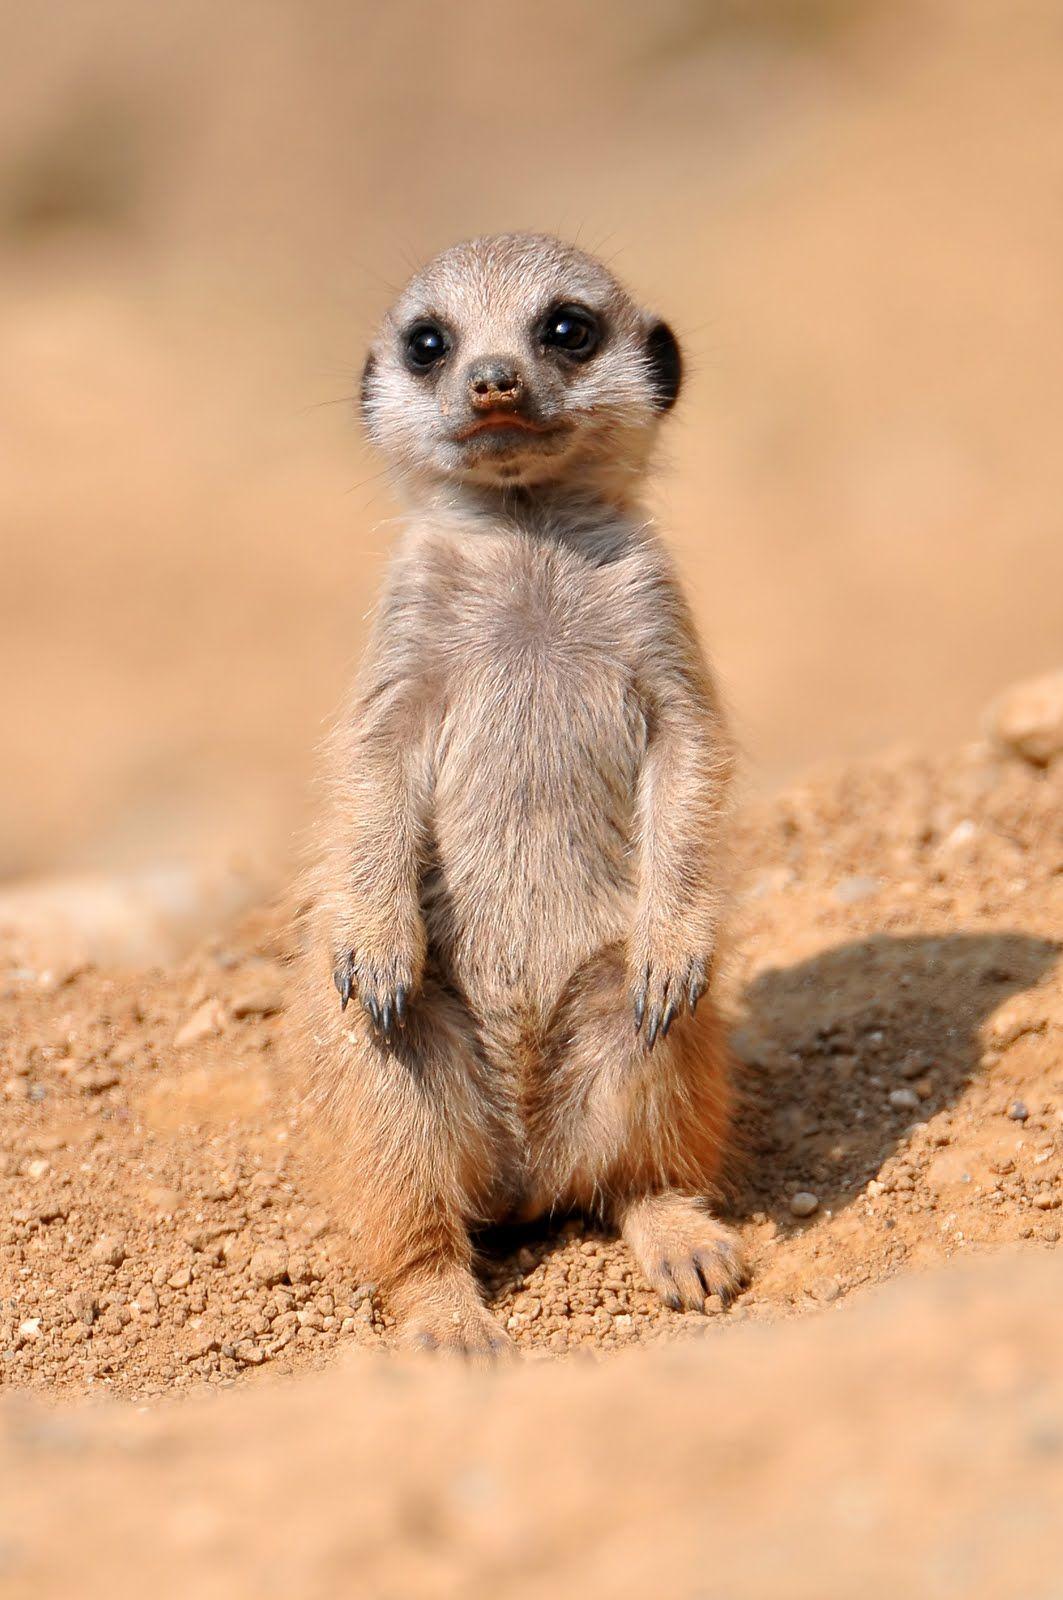 f-yeah baby animals : photo | : animals [fantastic] | pinterest